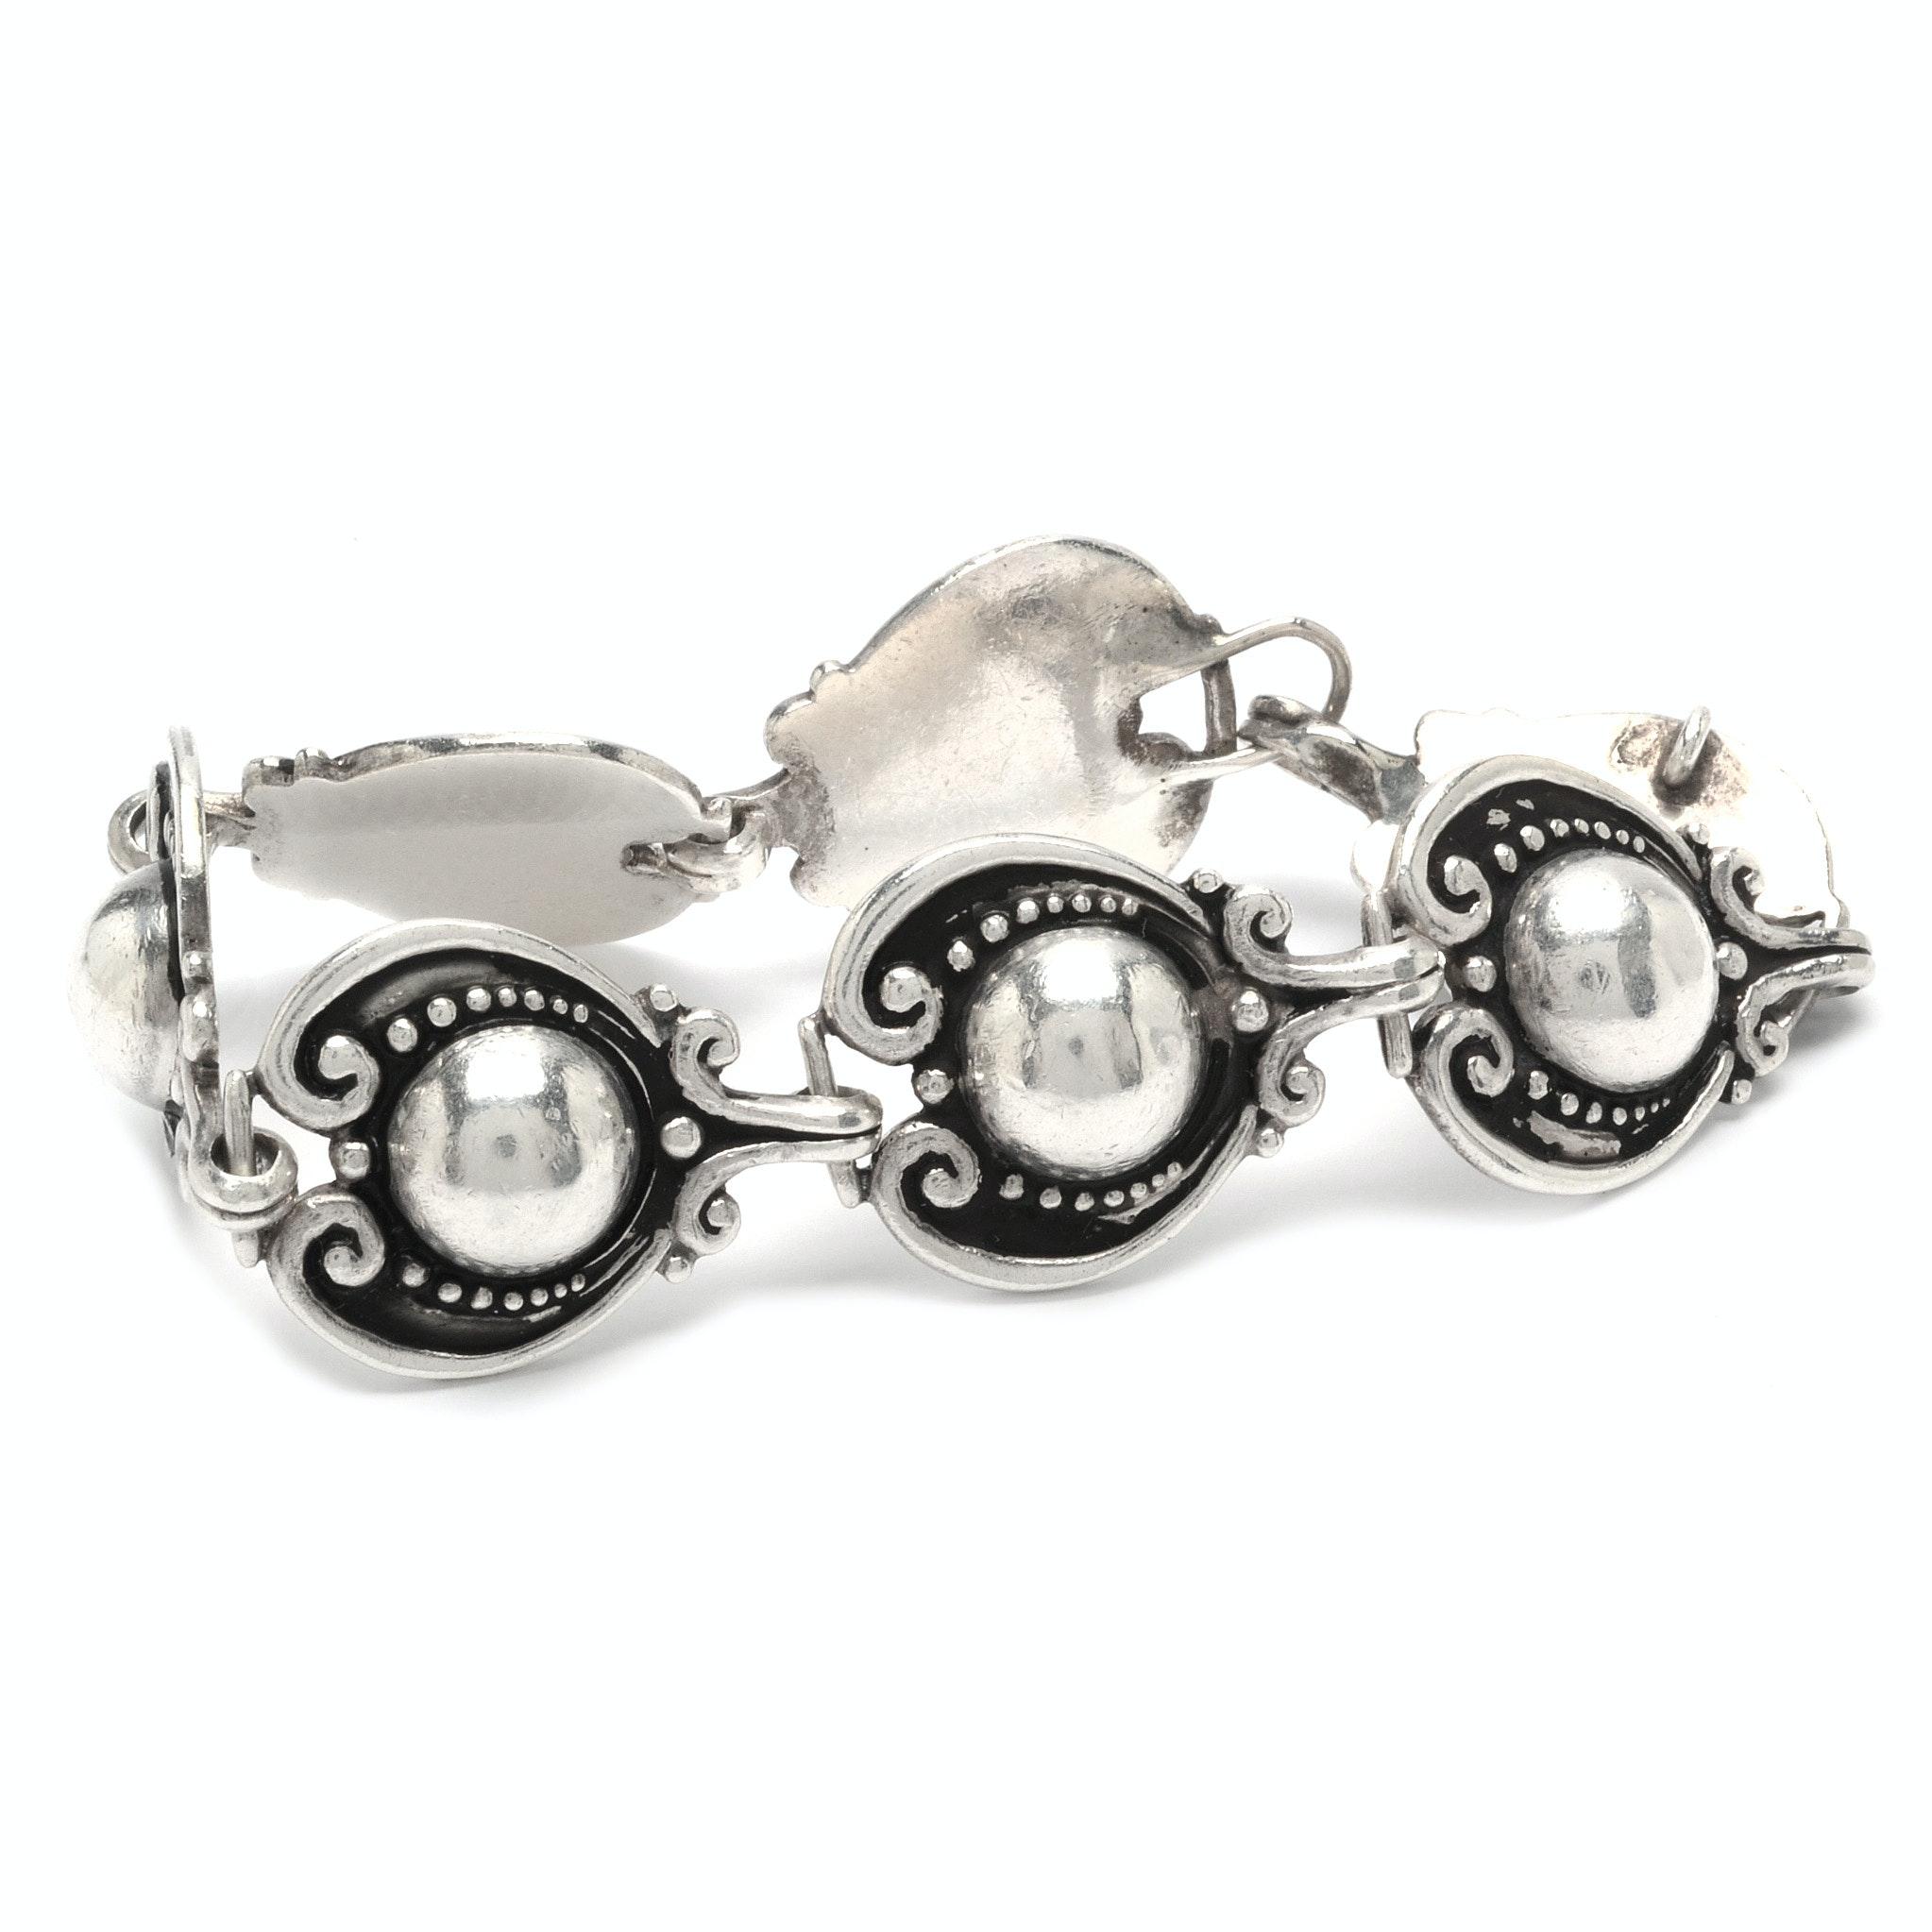 Signed Margot de Taxco Sterling Silver Bracelet